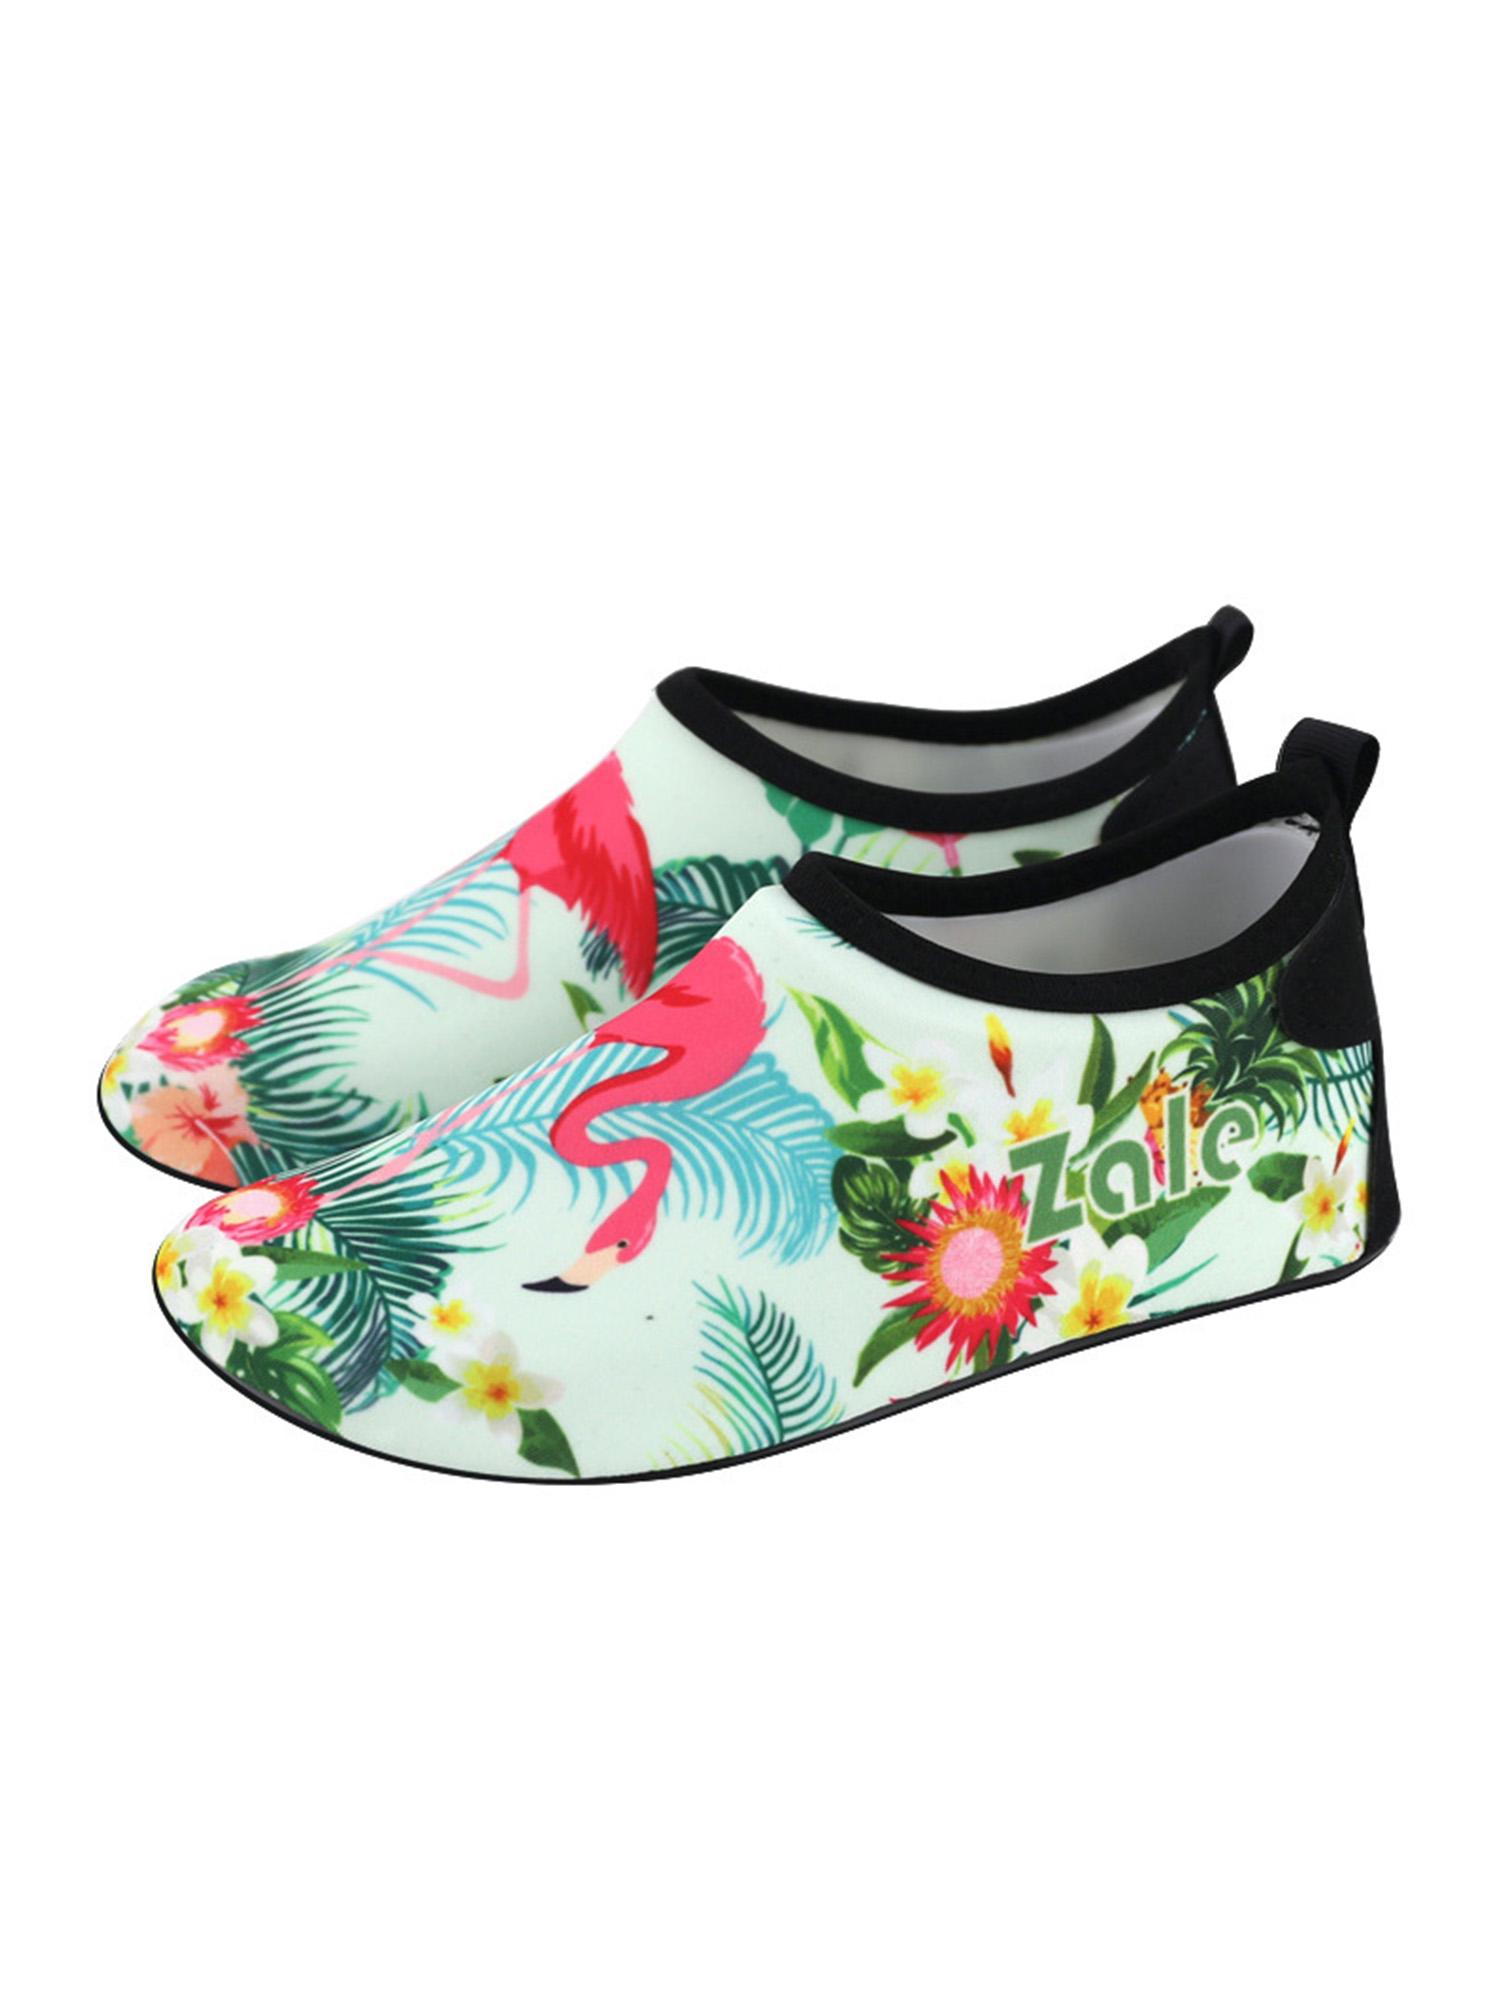 Details about  /Unisex Barefoot Water Skin Shoes Aqua Socks Beach Swim Surf Yoga Swim Exercise